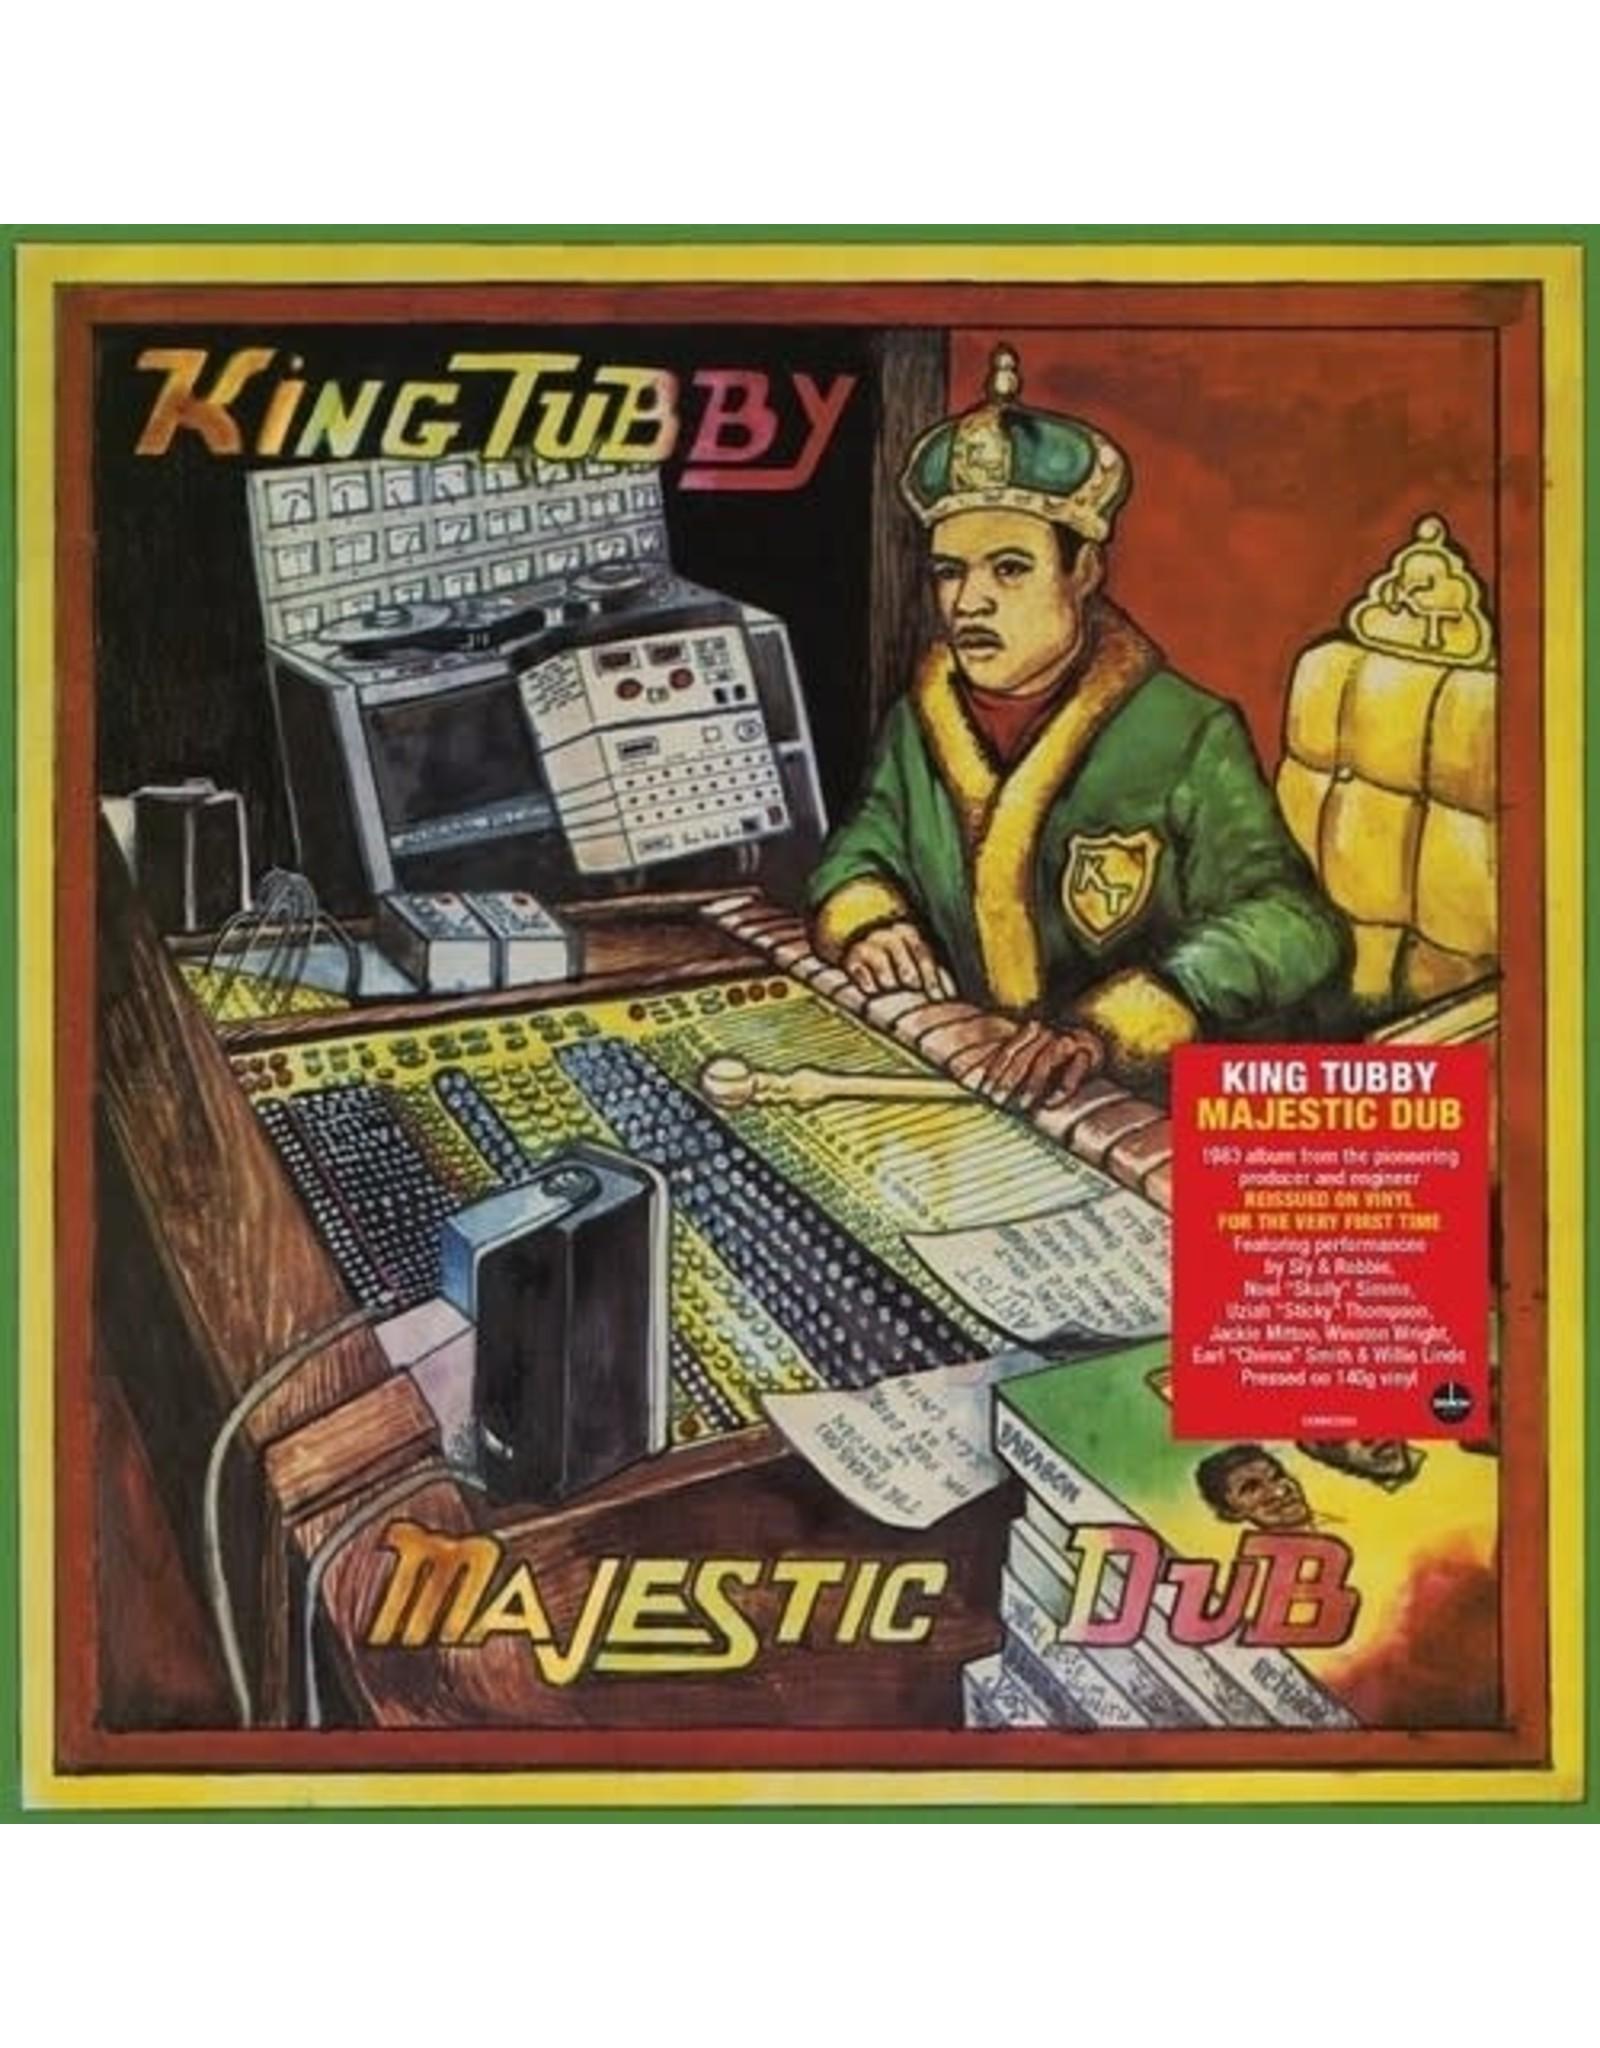 New Vinyl King Tubby - Majestic Dub LP